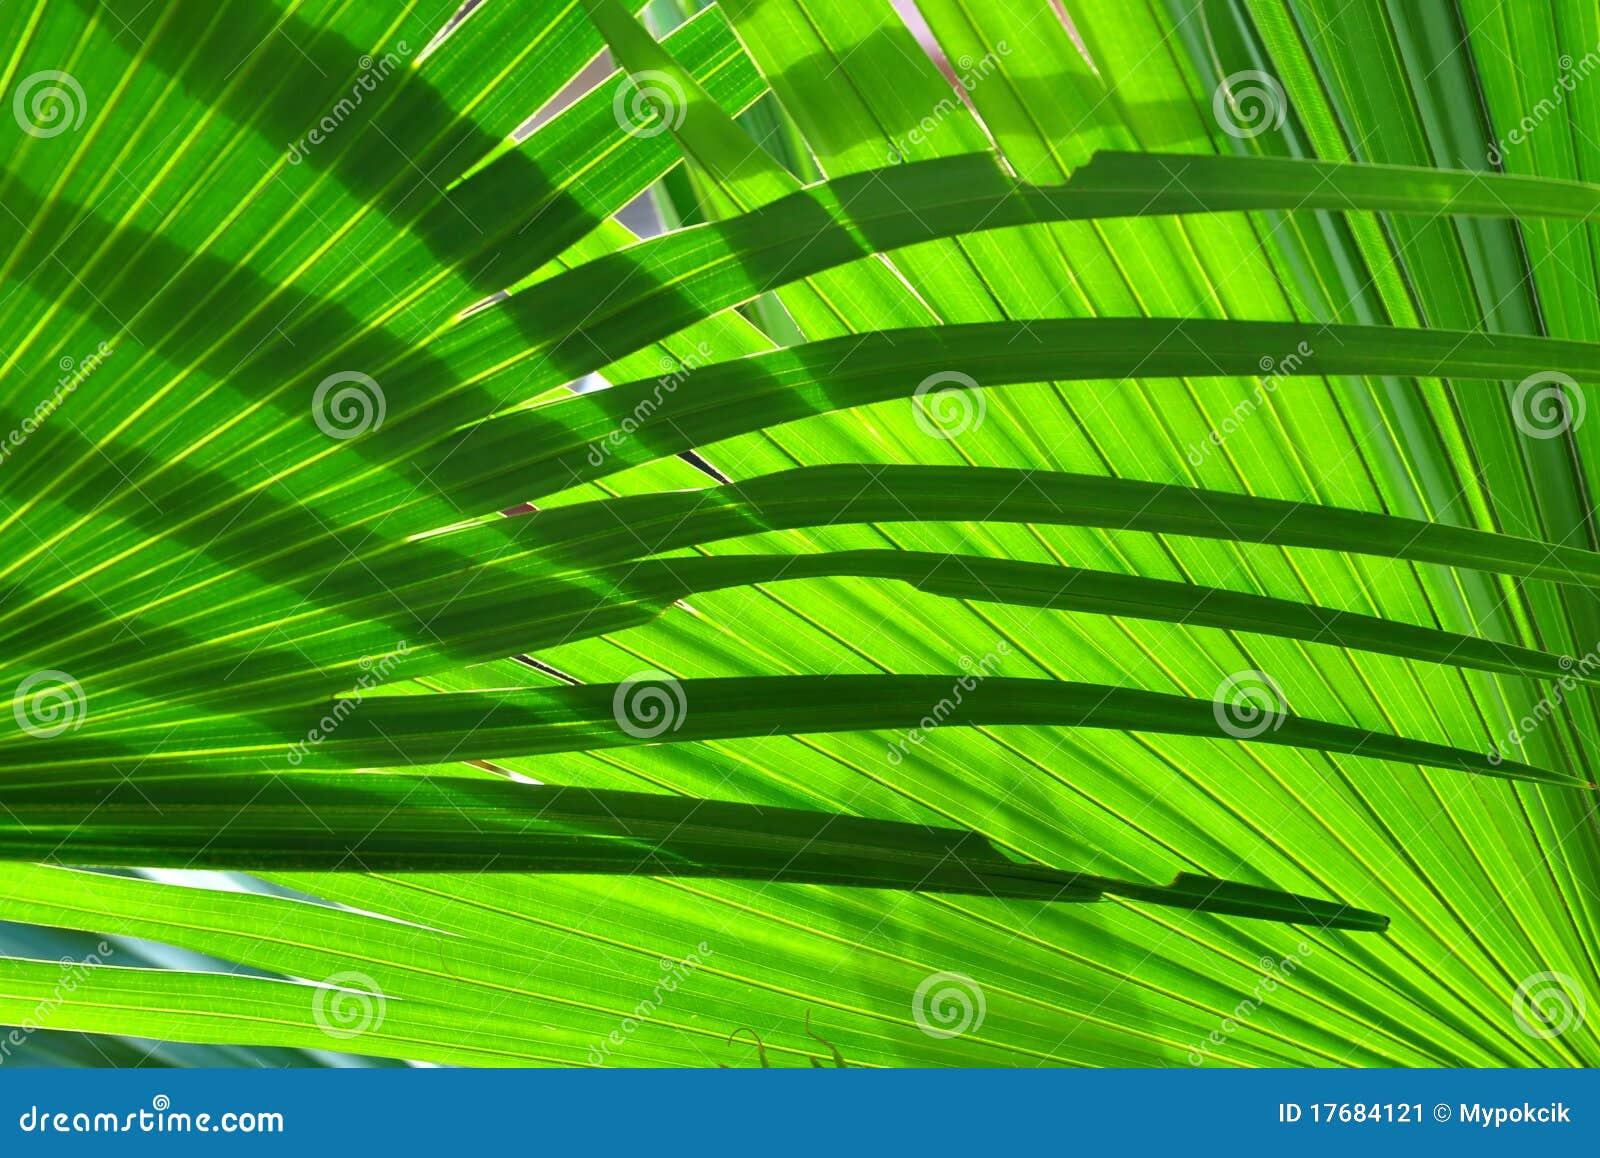 Fond en feuille de palmier